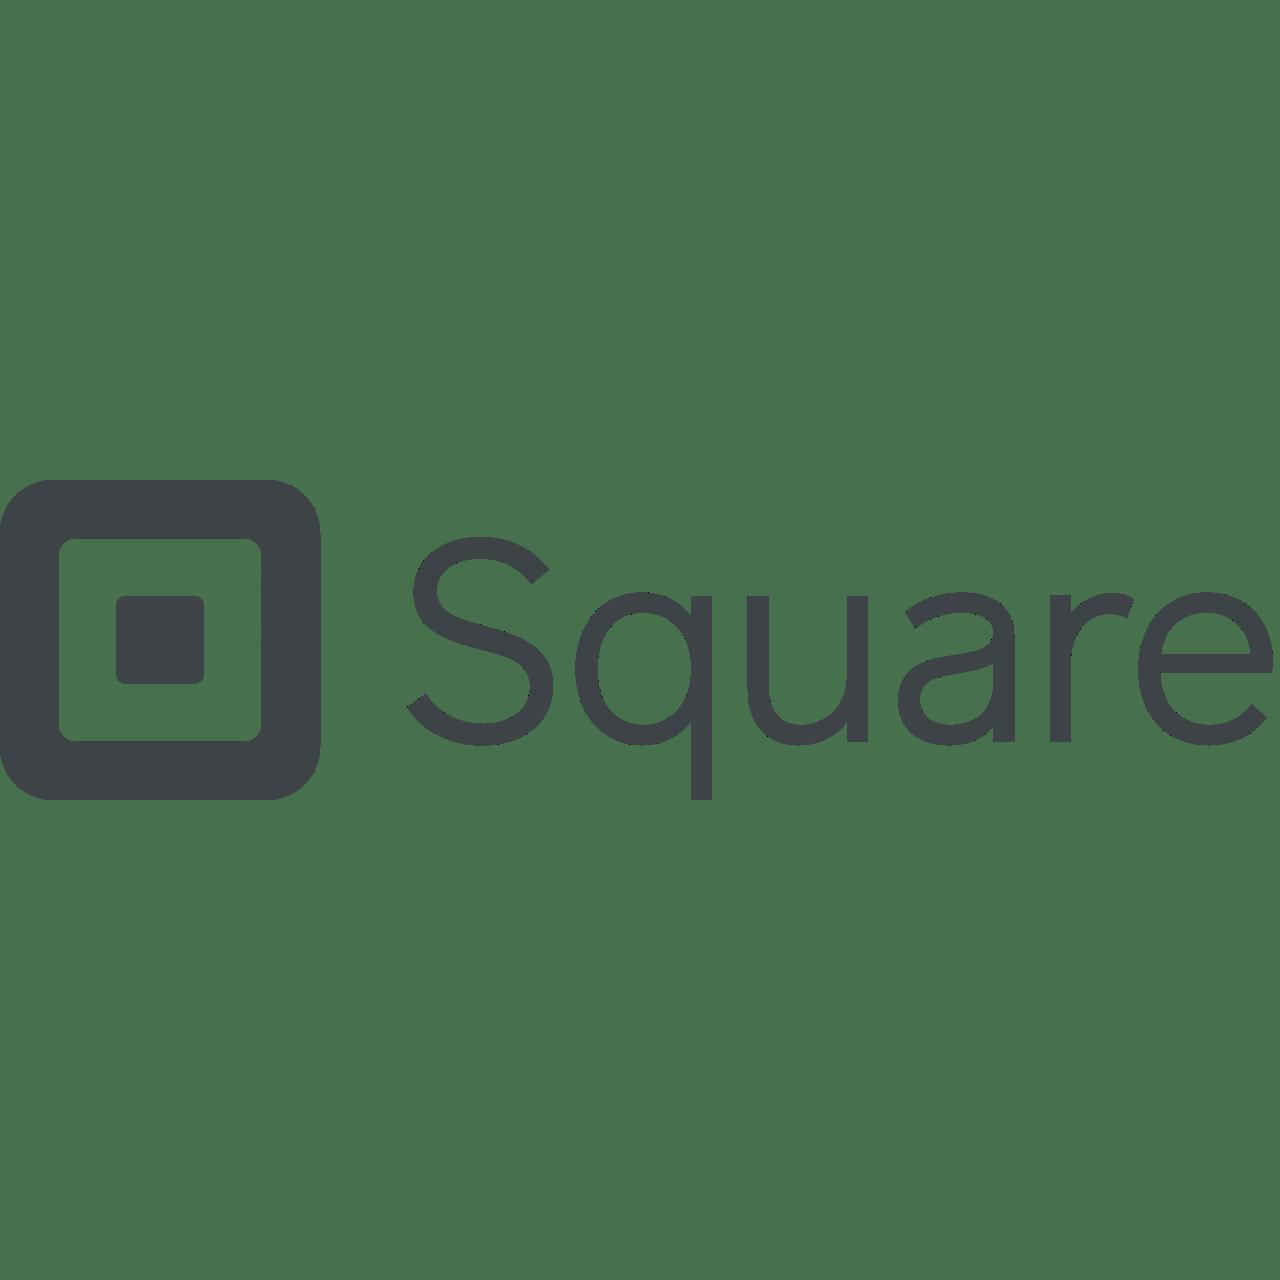 Square | Fundamentale Aktienanalyse